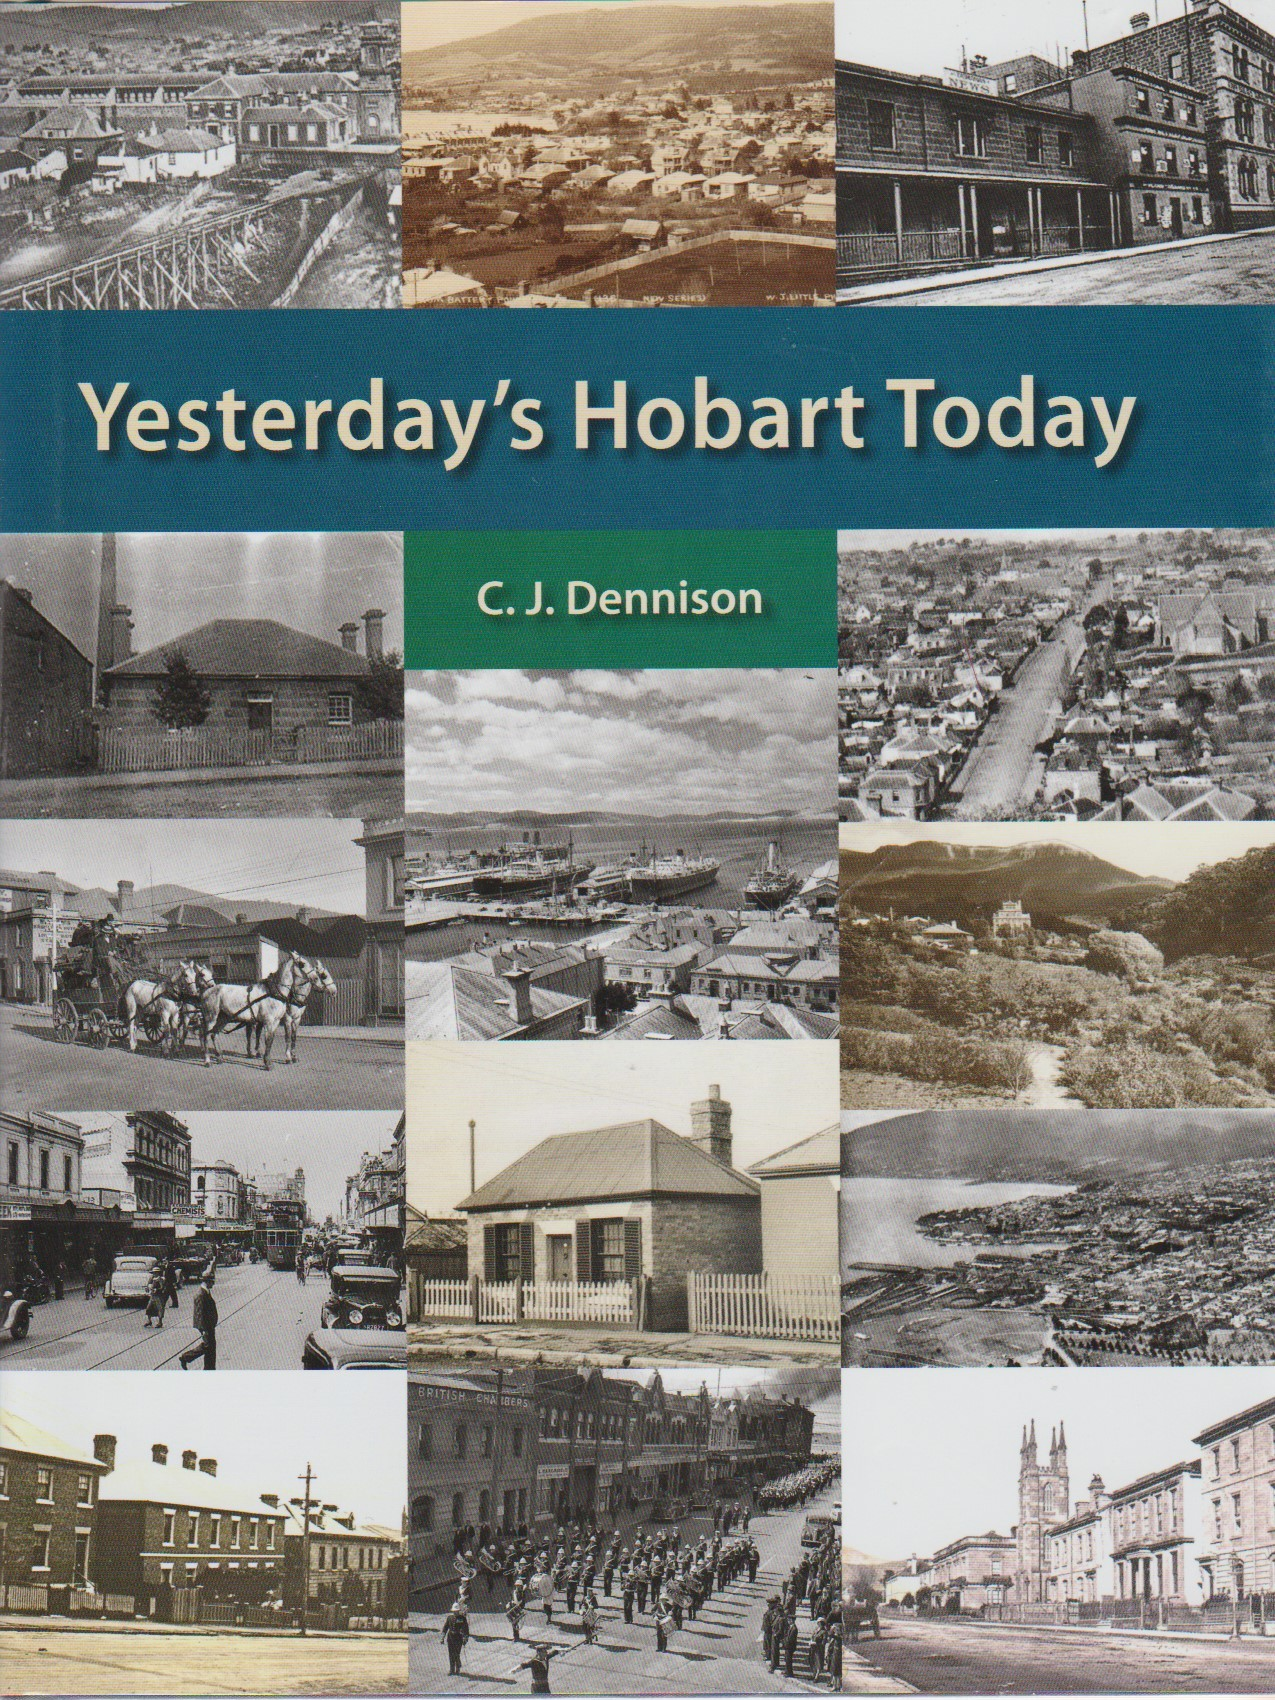 Yesterday's Hobart Today